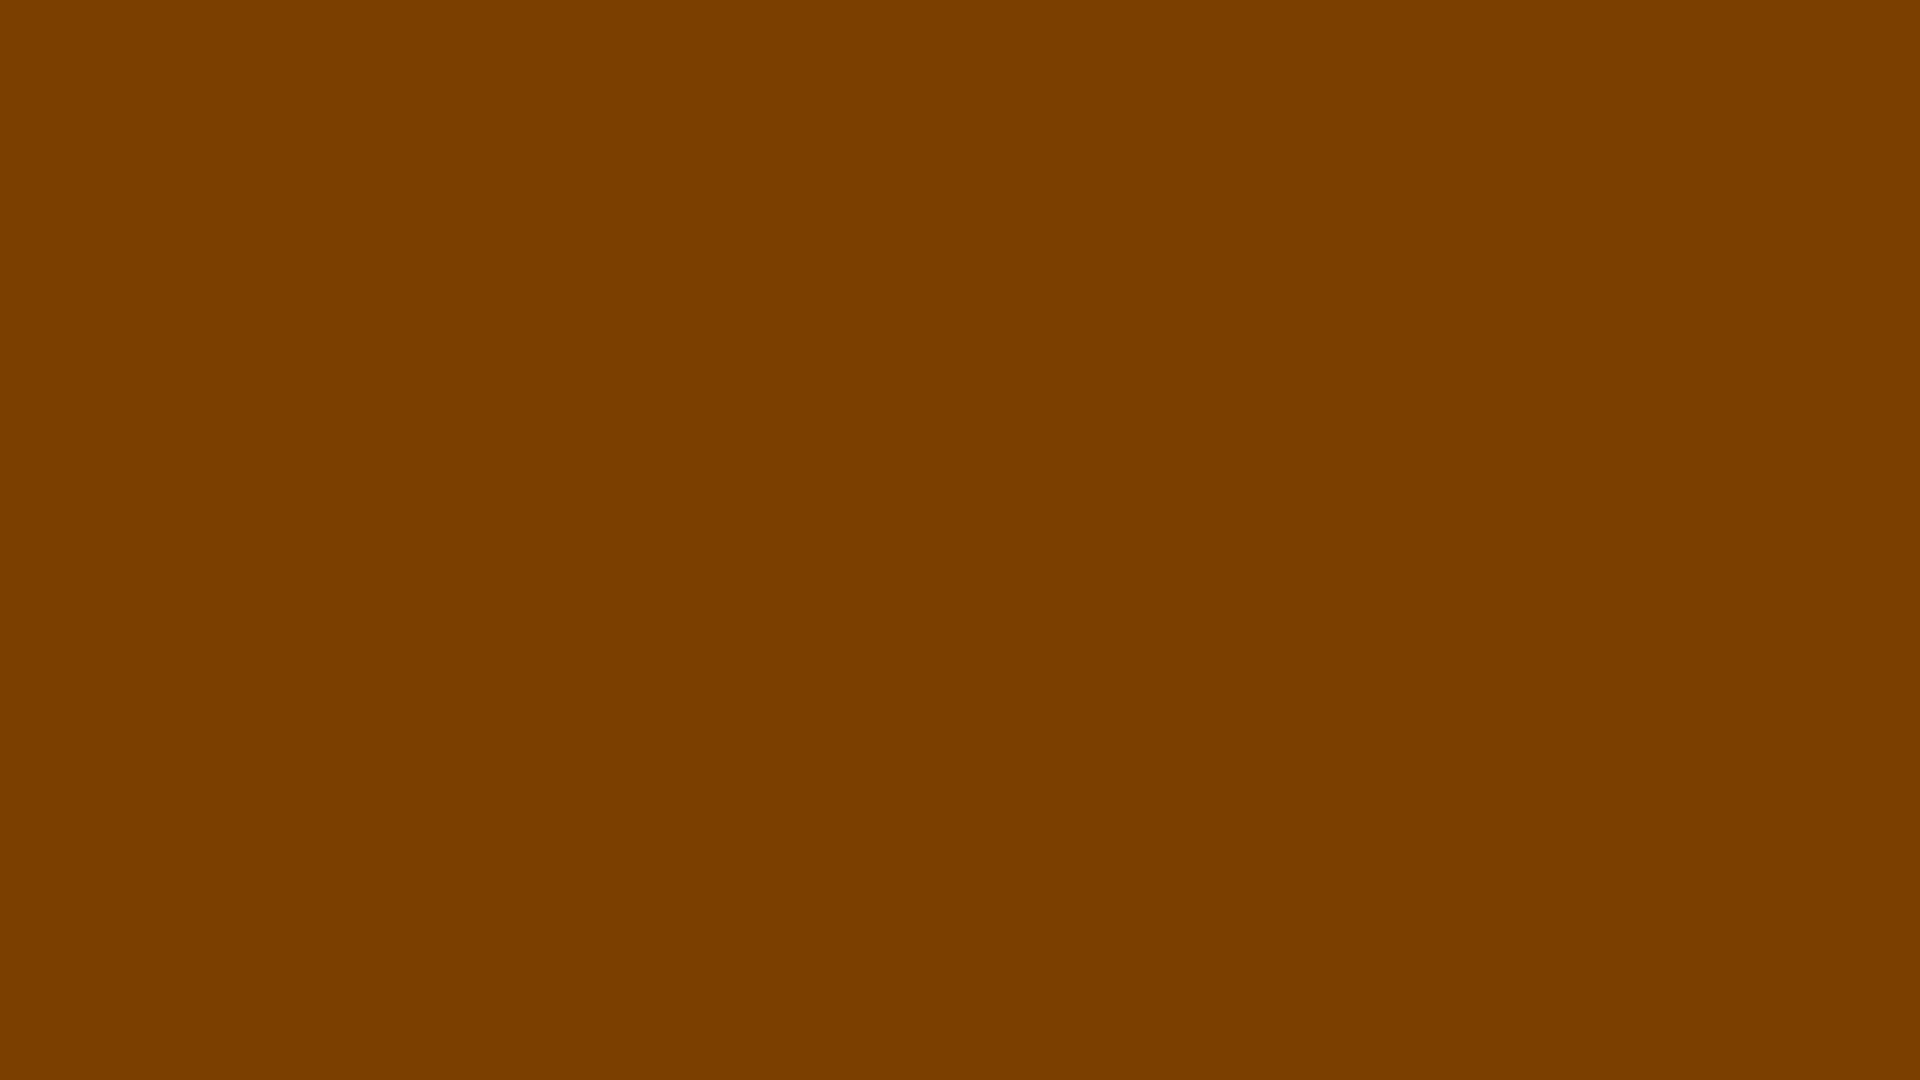 Chocolate Backgrounds 1920x1080 chocolate 1920x1080